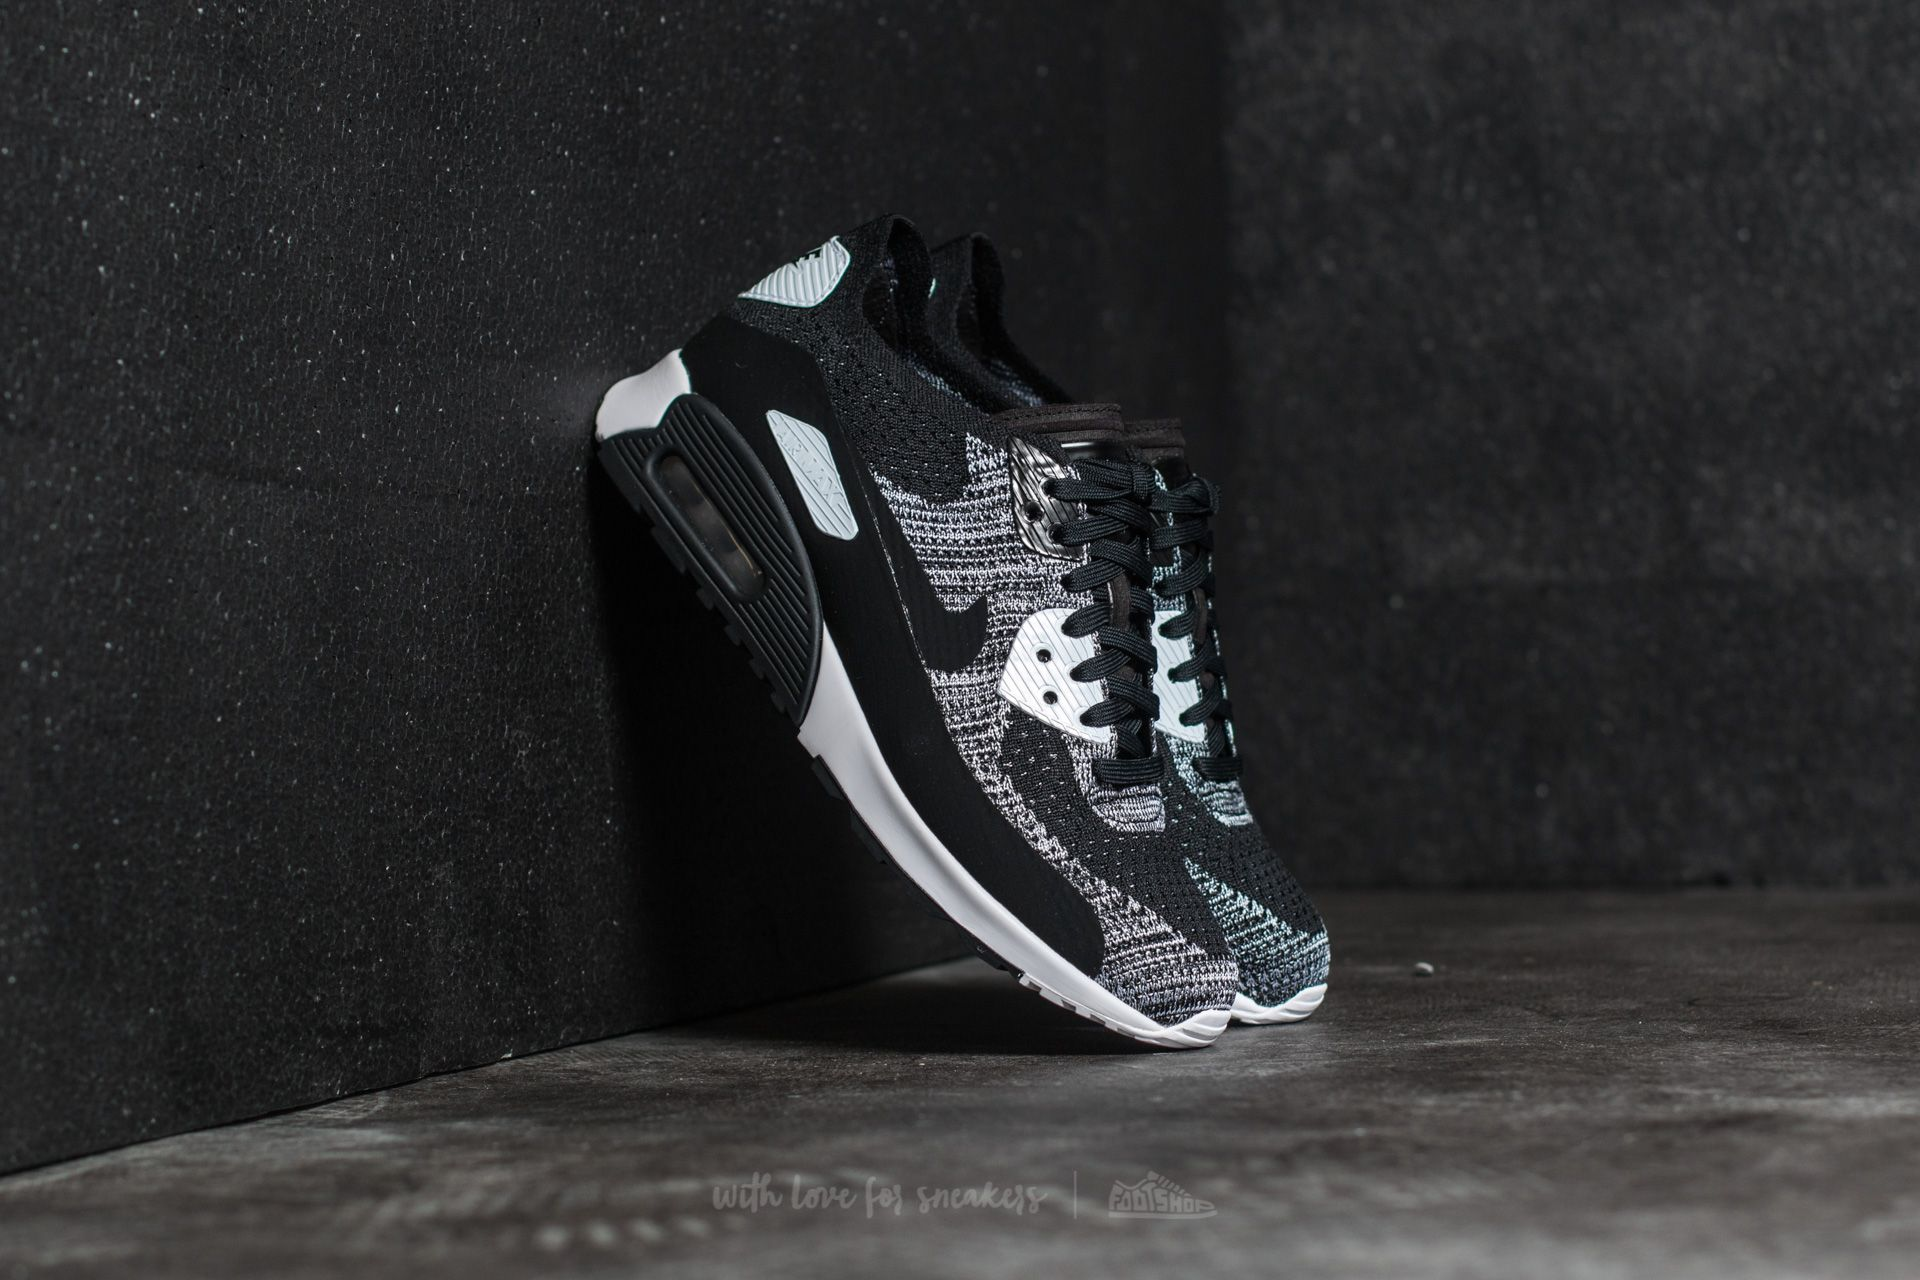 Nike W Air Max 90 Ultra 2.0 Flyknit Black  Black-White-Anthracite ... ff6831f014